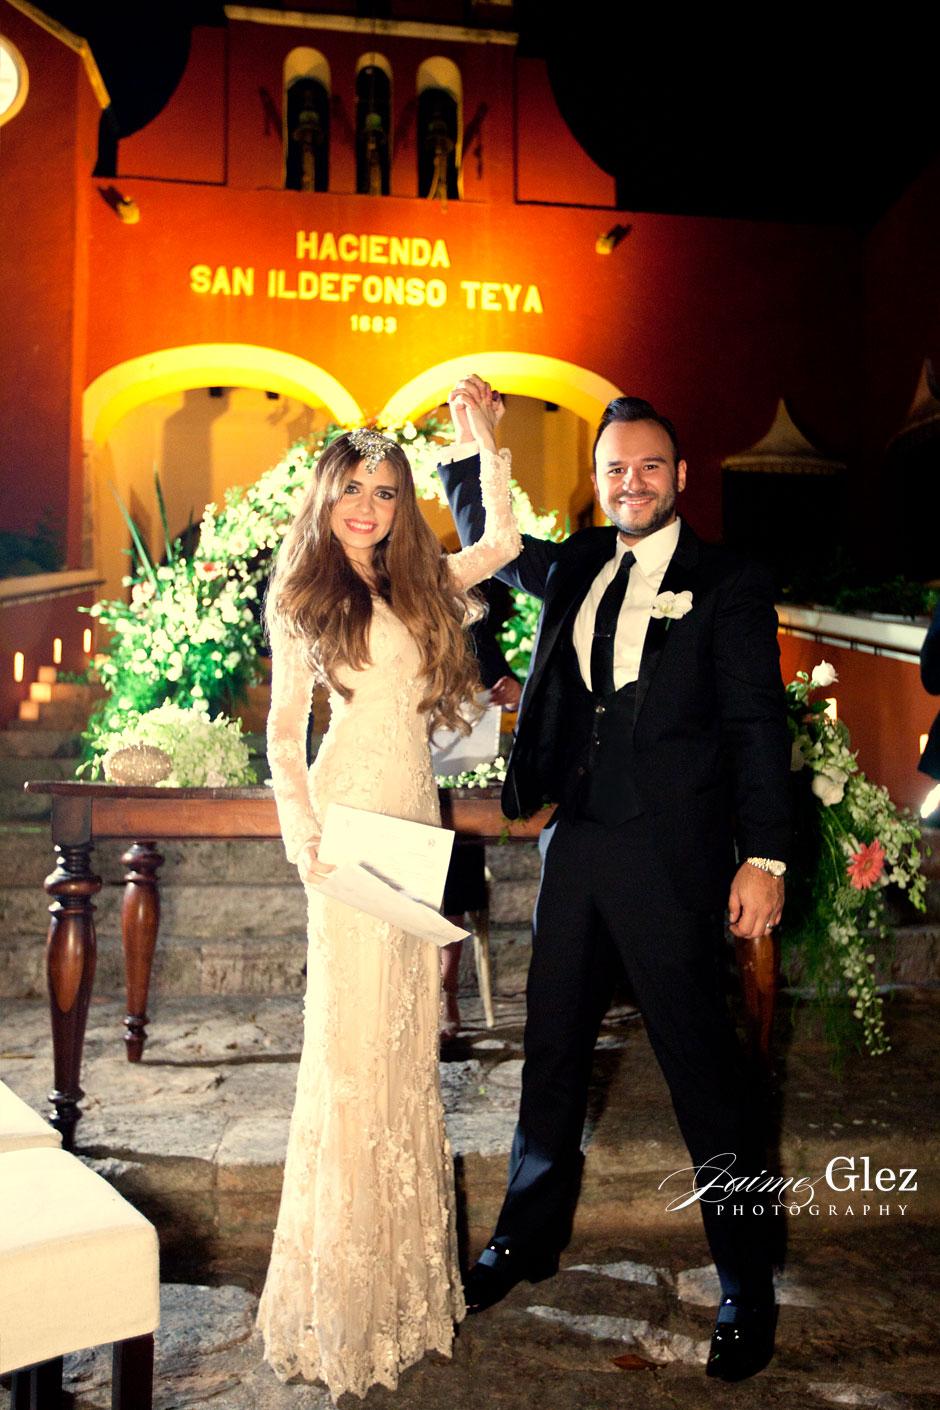 hacienda teya bodas 13